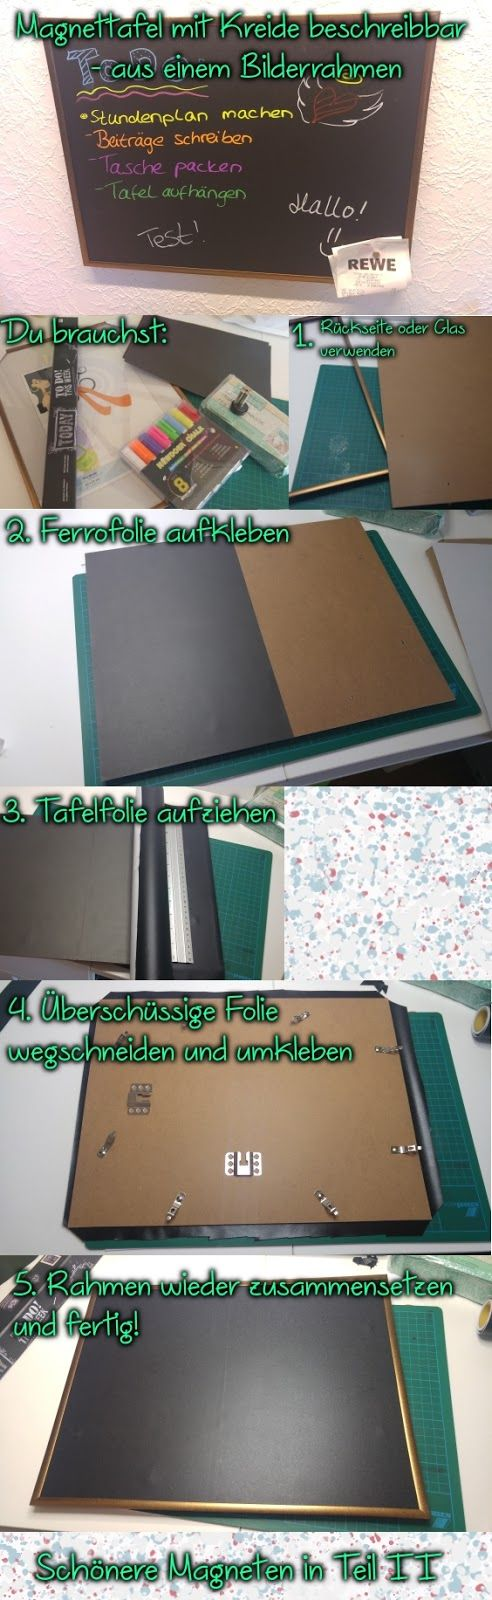 Mischmaschquatsch: DIY: Magnetpinnwand mit Kreide beschreibbar